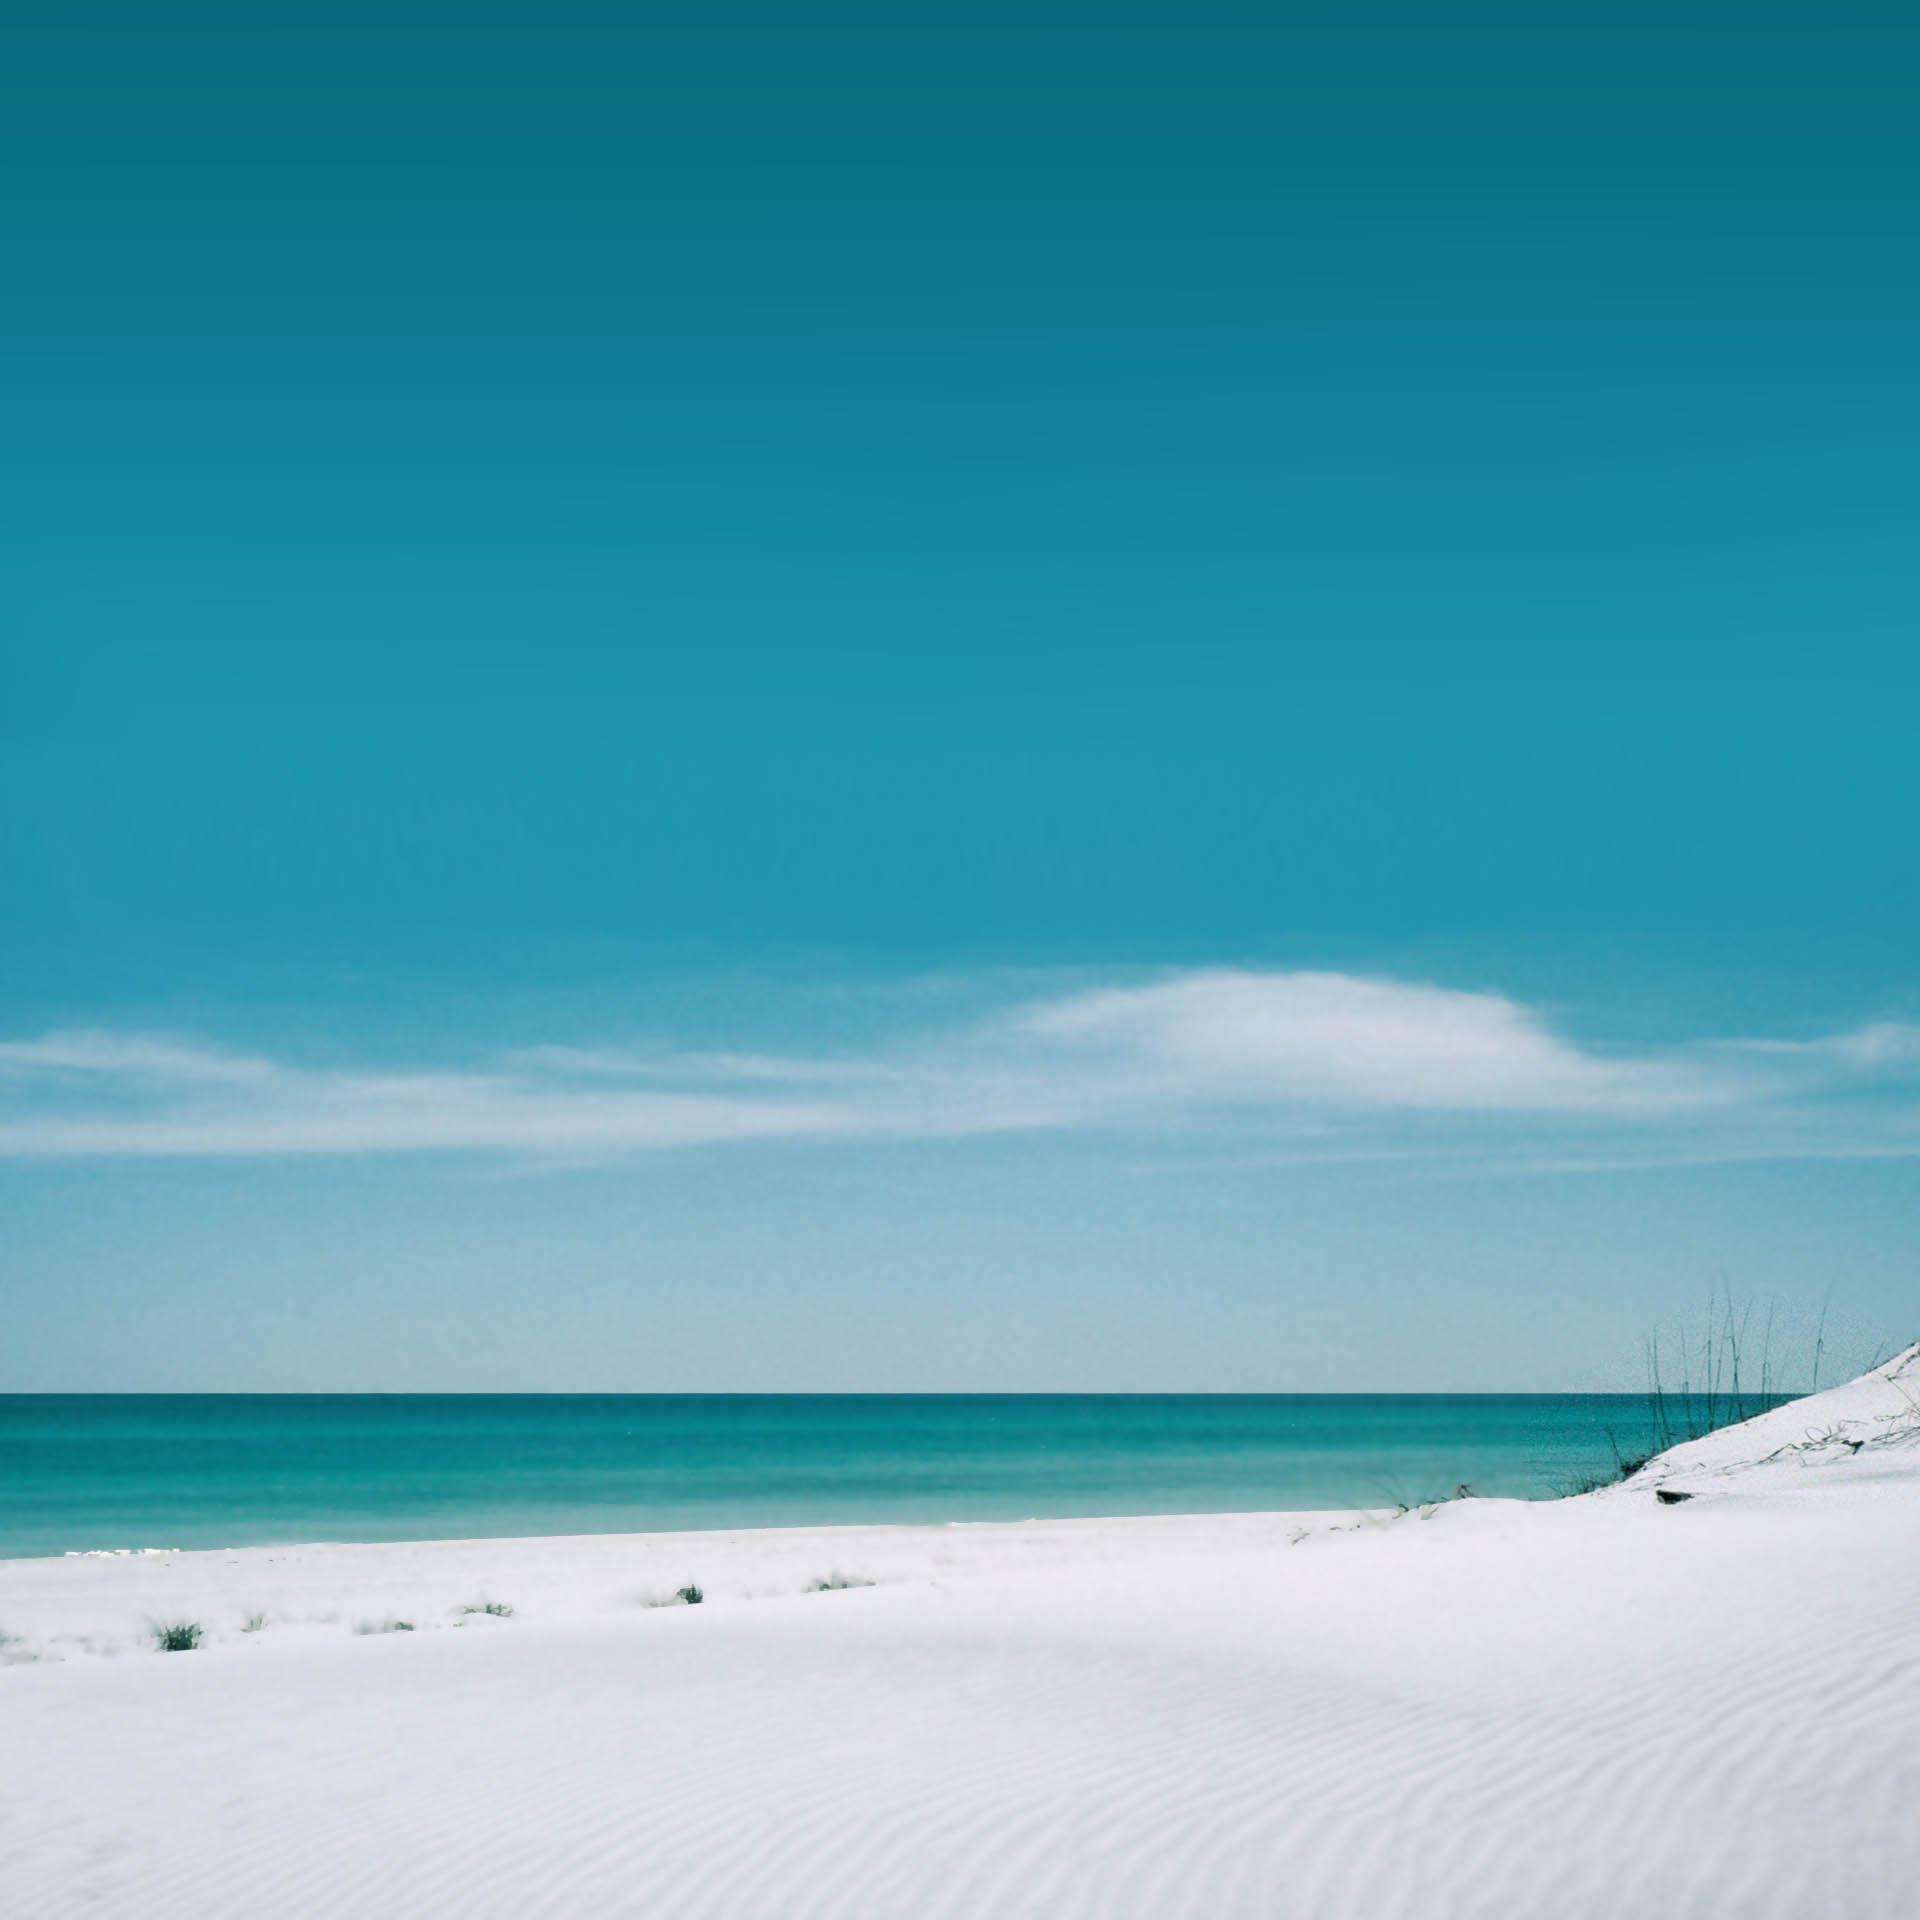 Sea and White Sand